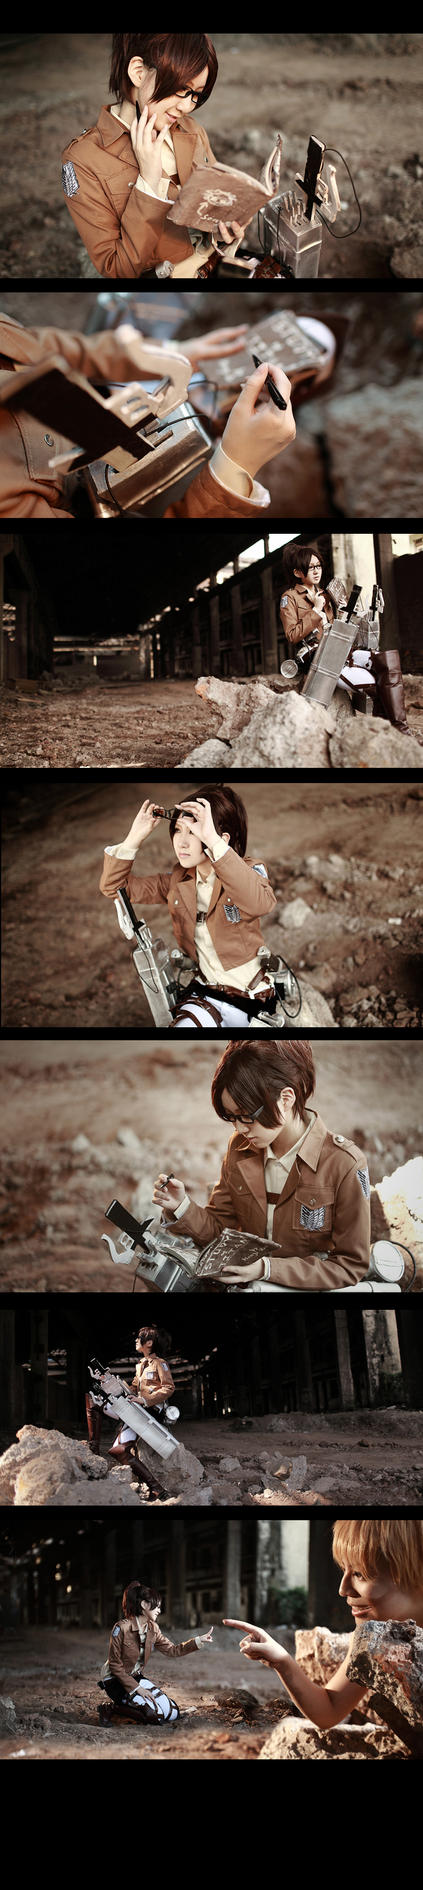 Attack on Titan Hanji Zoe4 by 35ryo